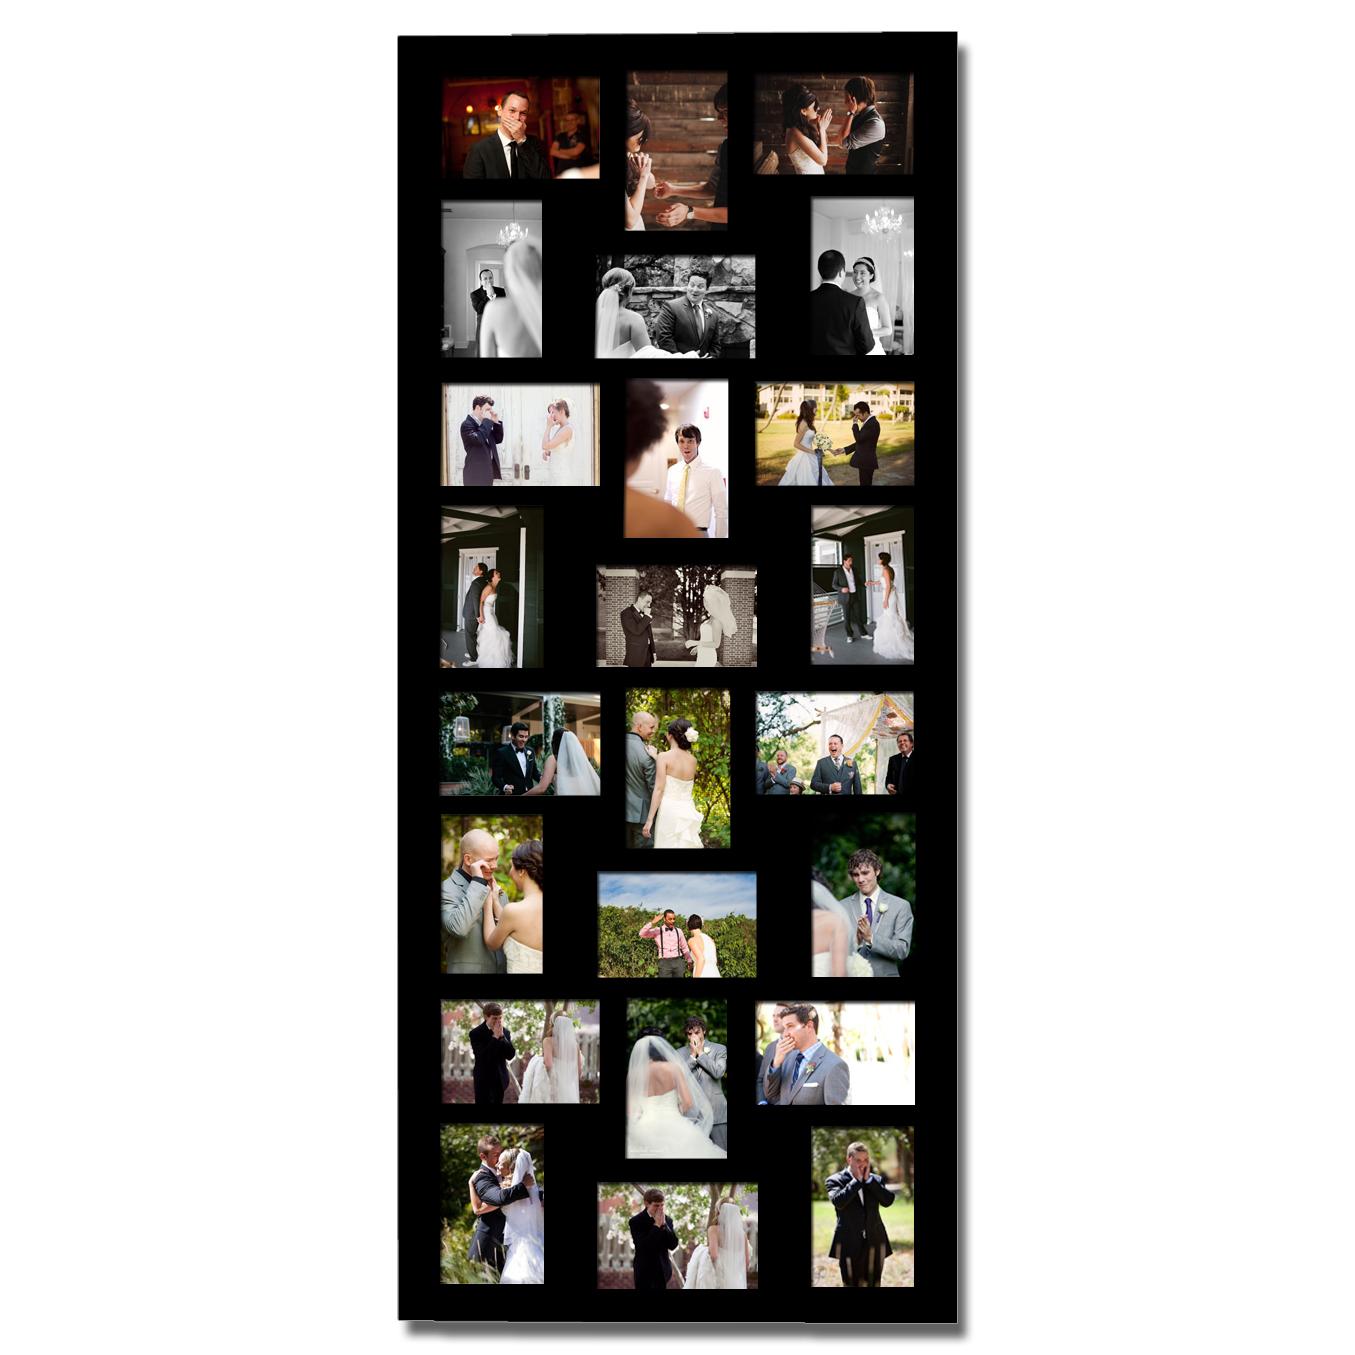 bilderrahmen fotorahmen fotogalerie collage holz rahmen 24. Black Bedroom Furniture Sets. Home Design Ideas